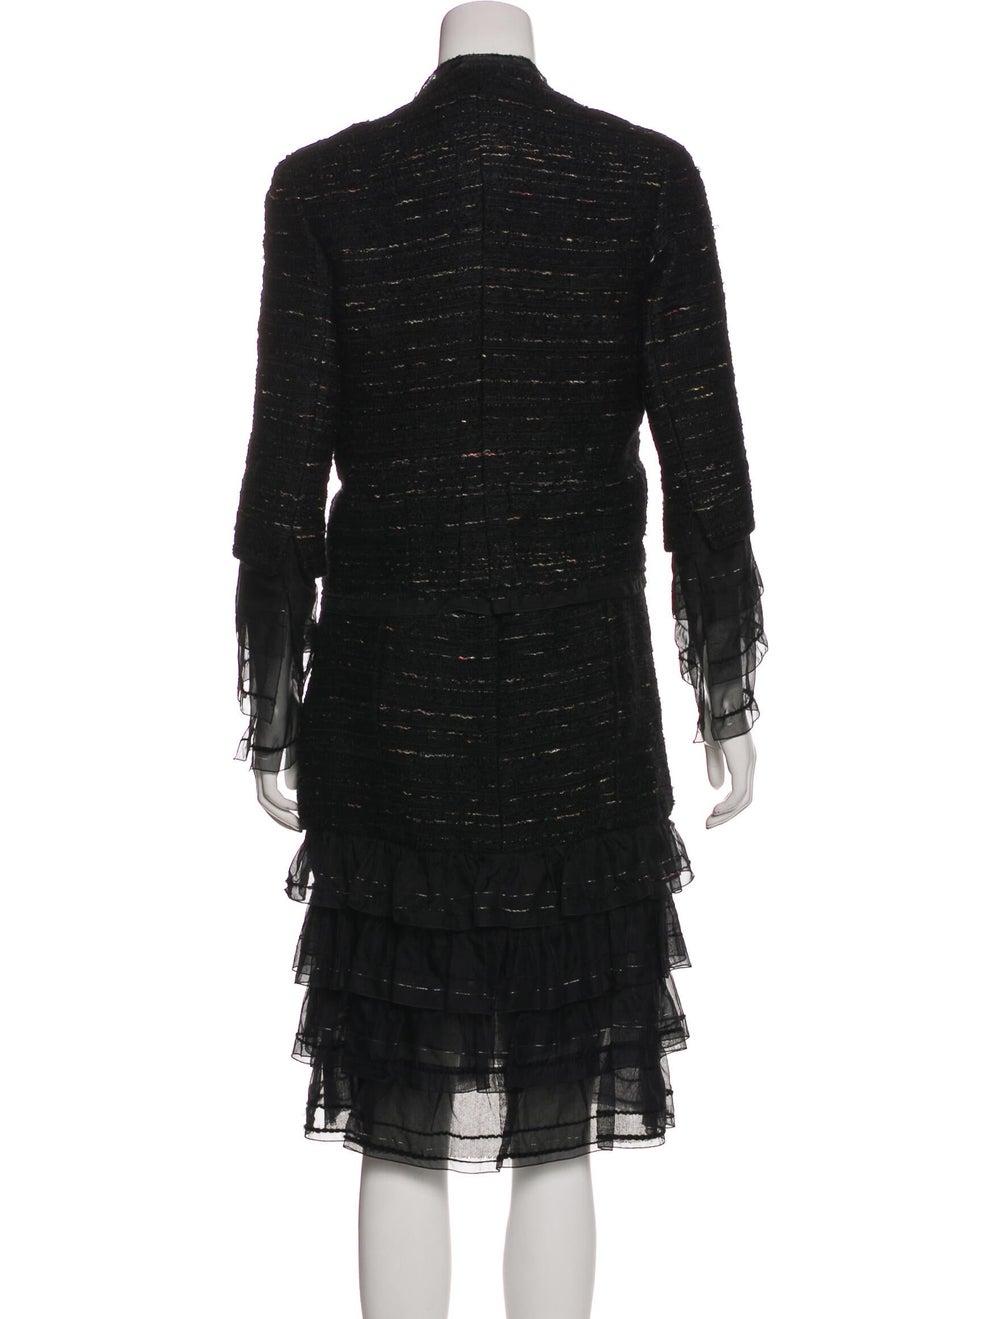 Chanel Metallic Tweed Dress Set Black - image 3